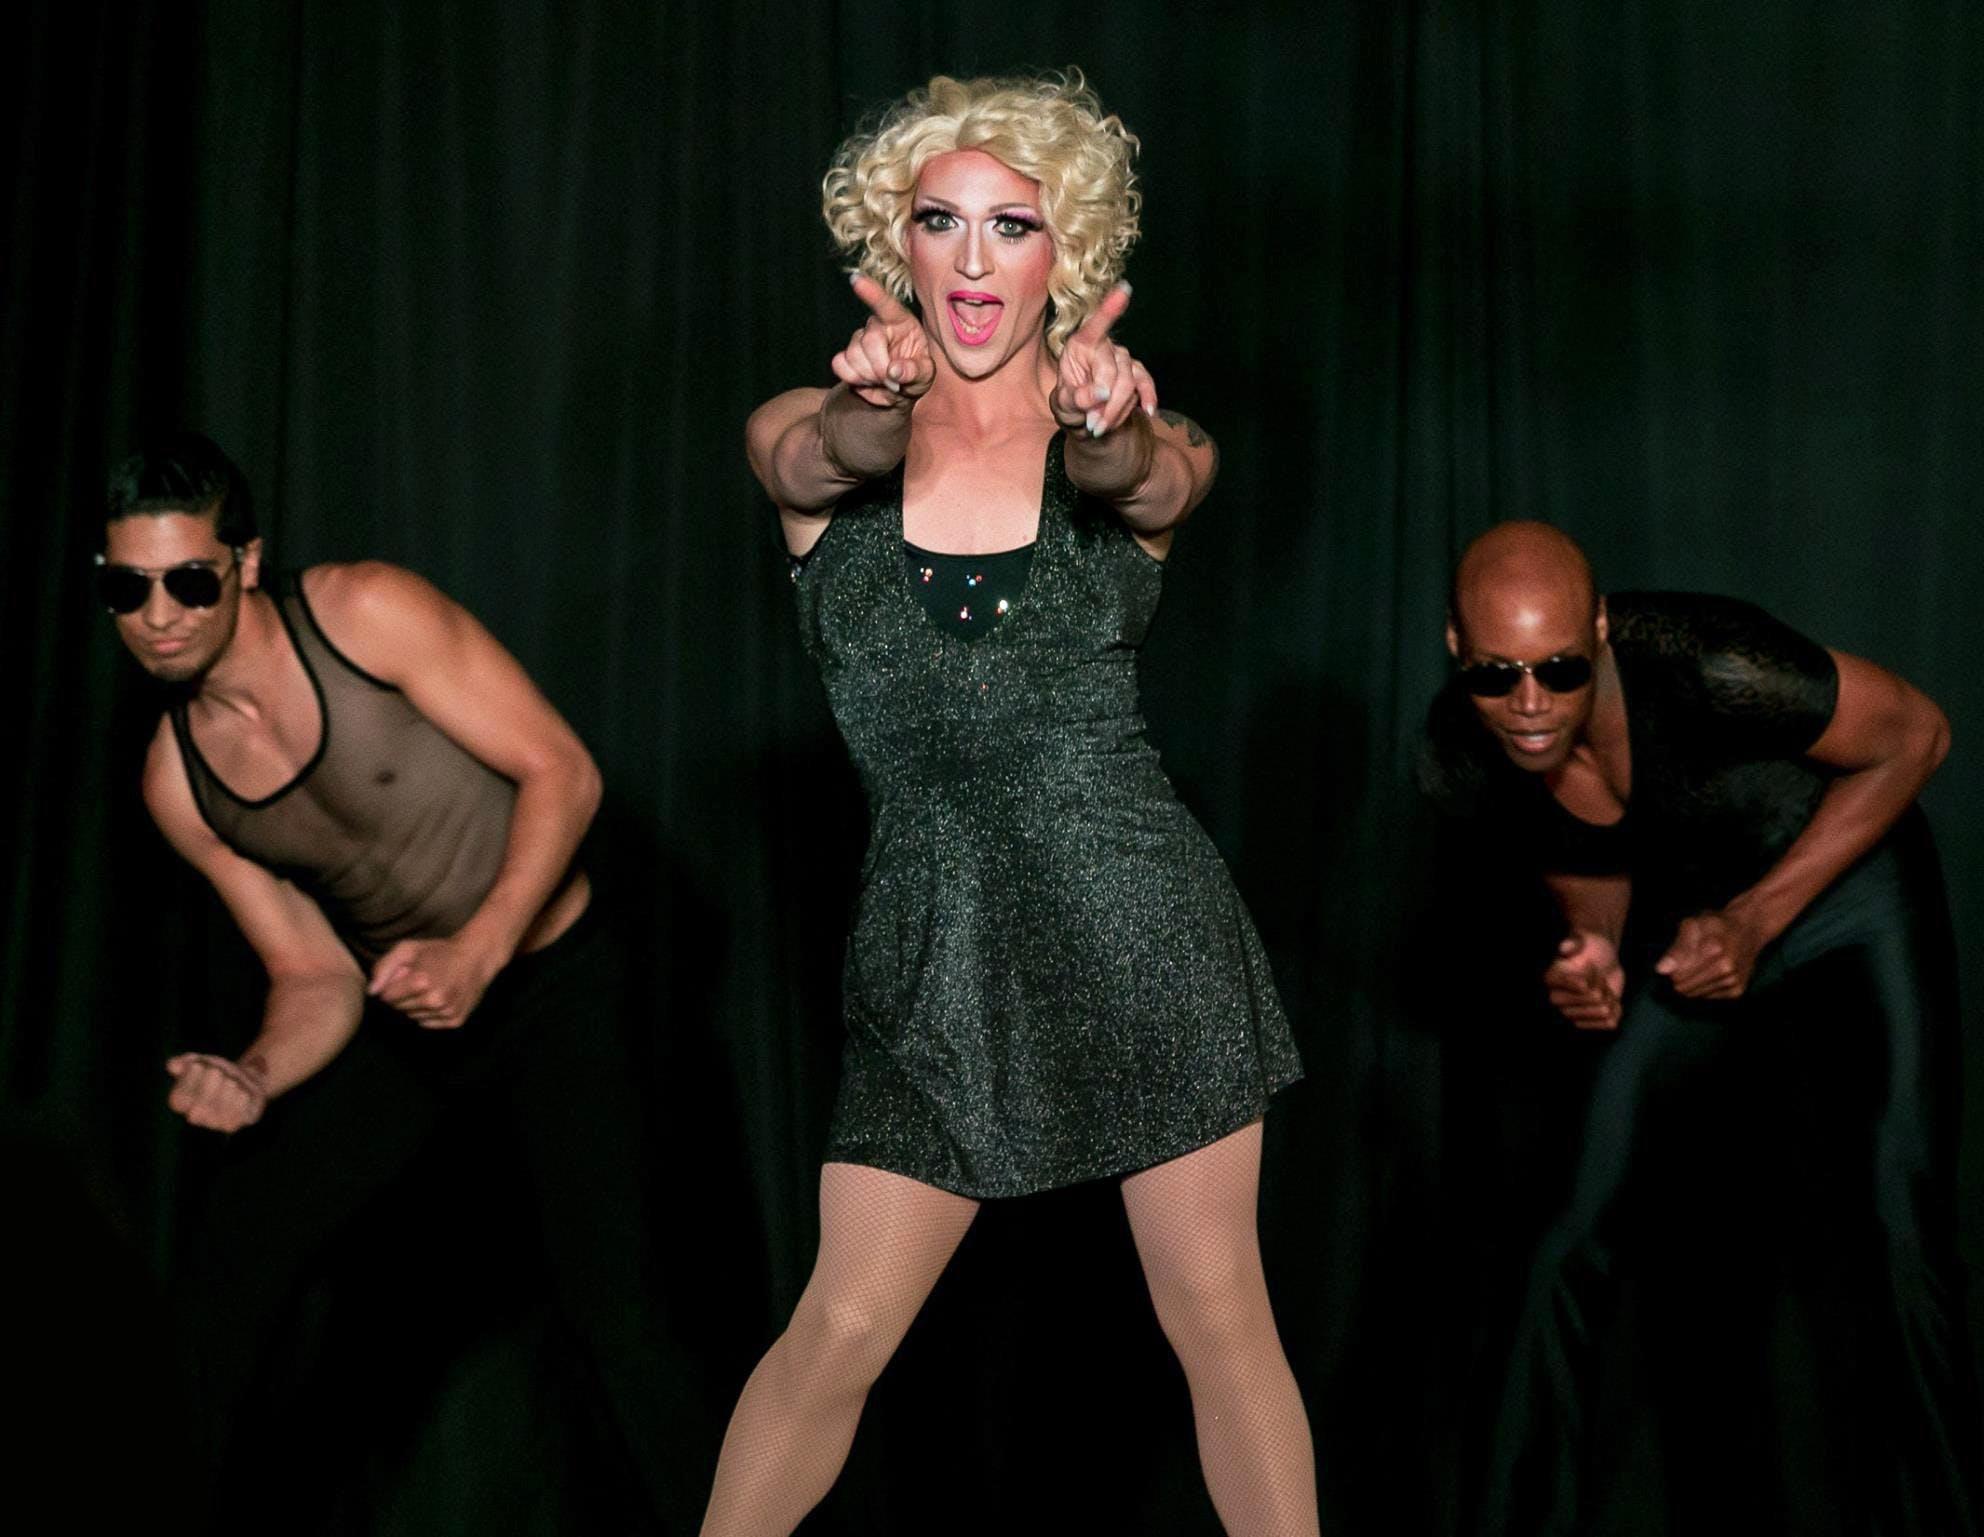 Musical Mayhem, Scorpius Dance Theatre's 4th Annual Drag Fundraiser